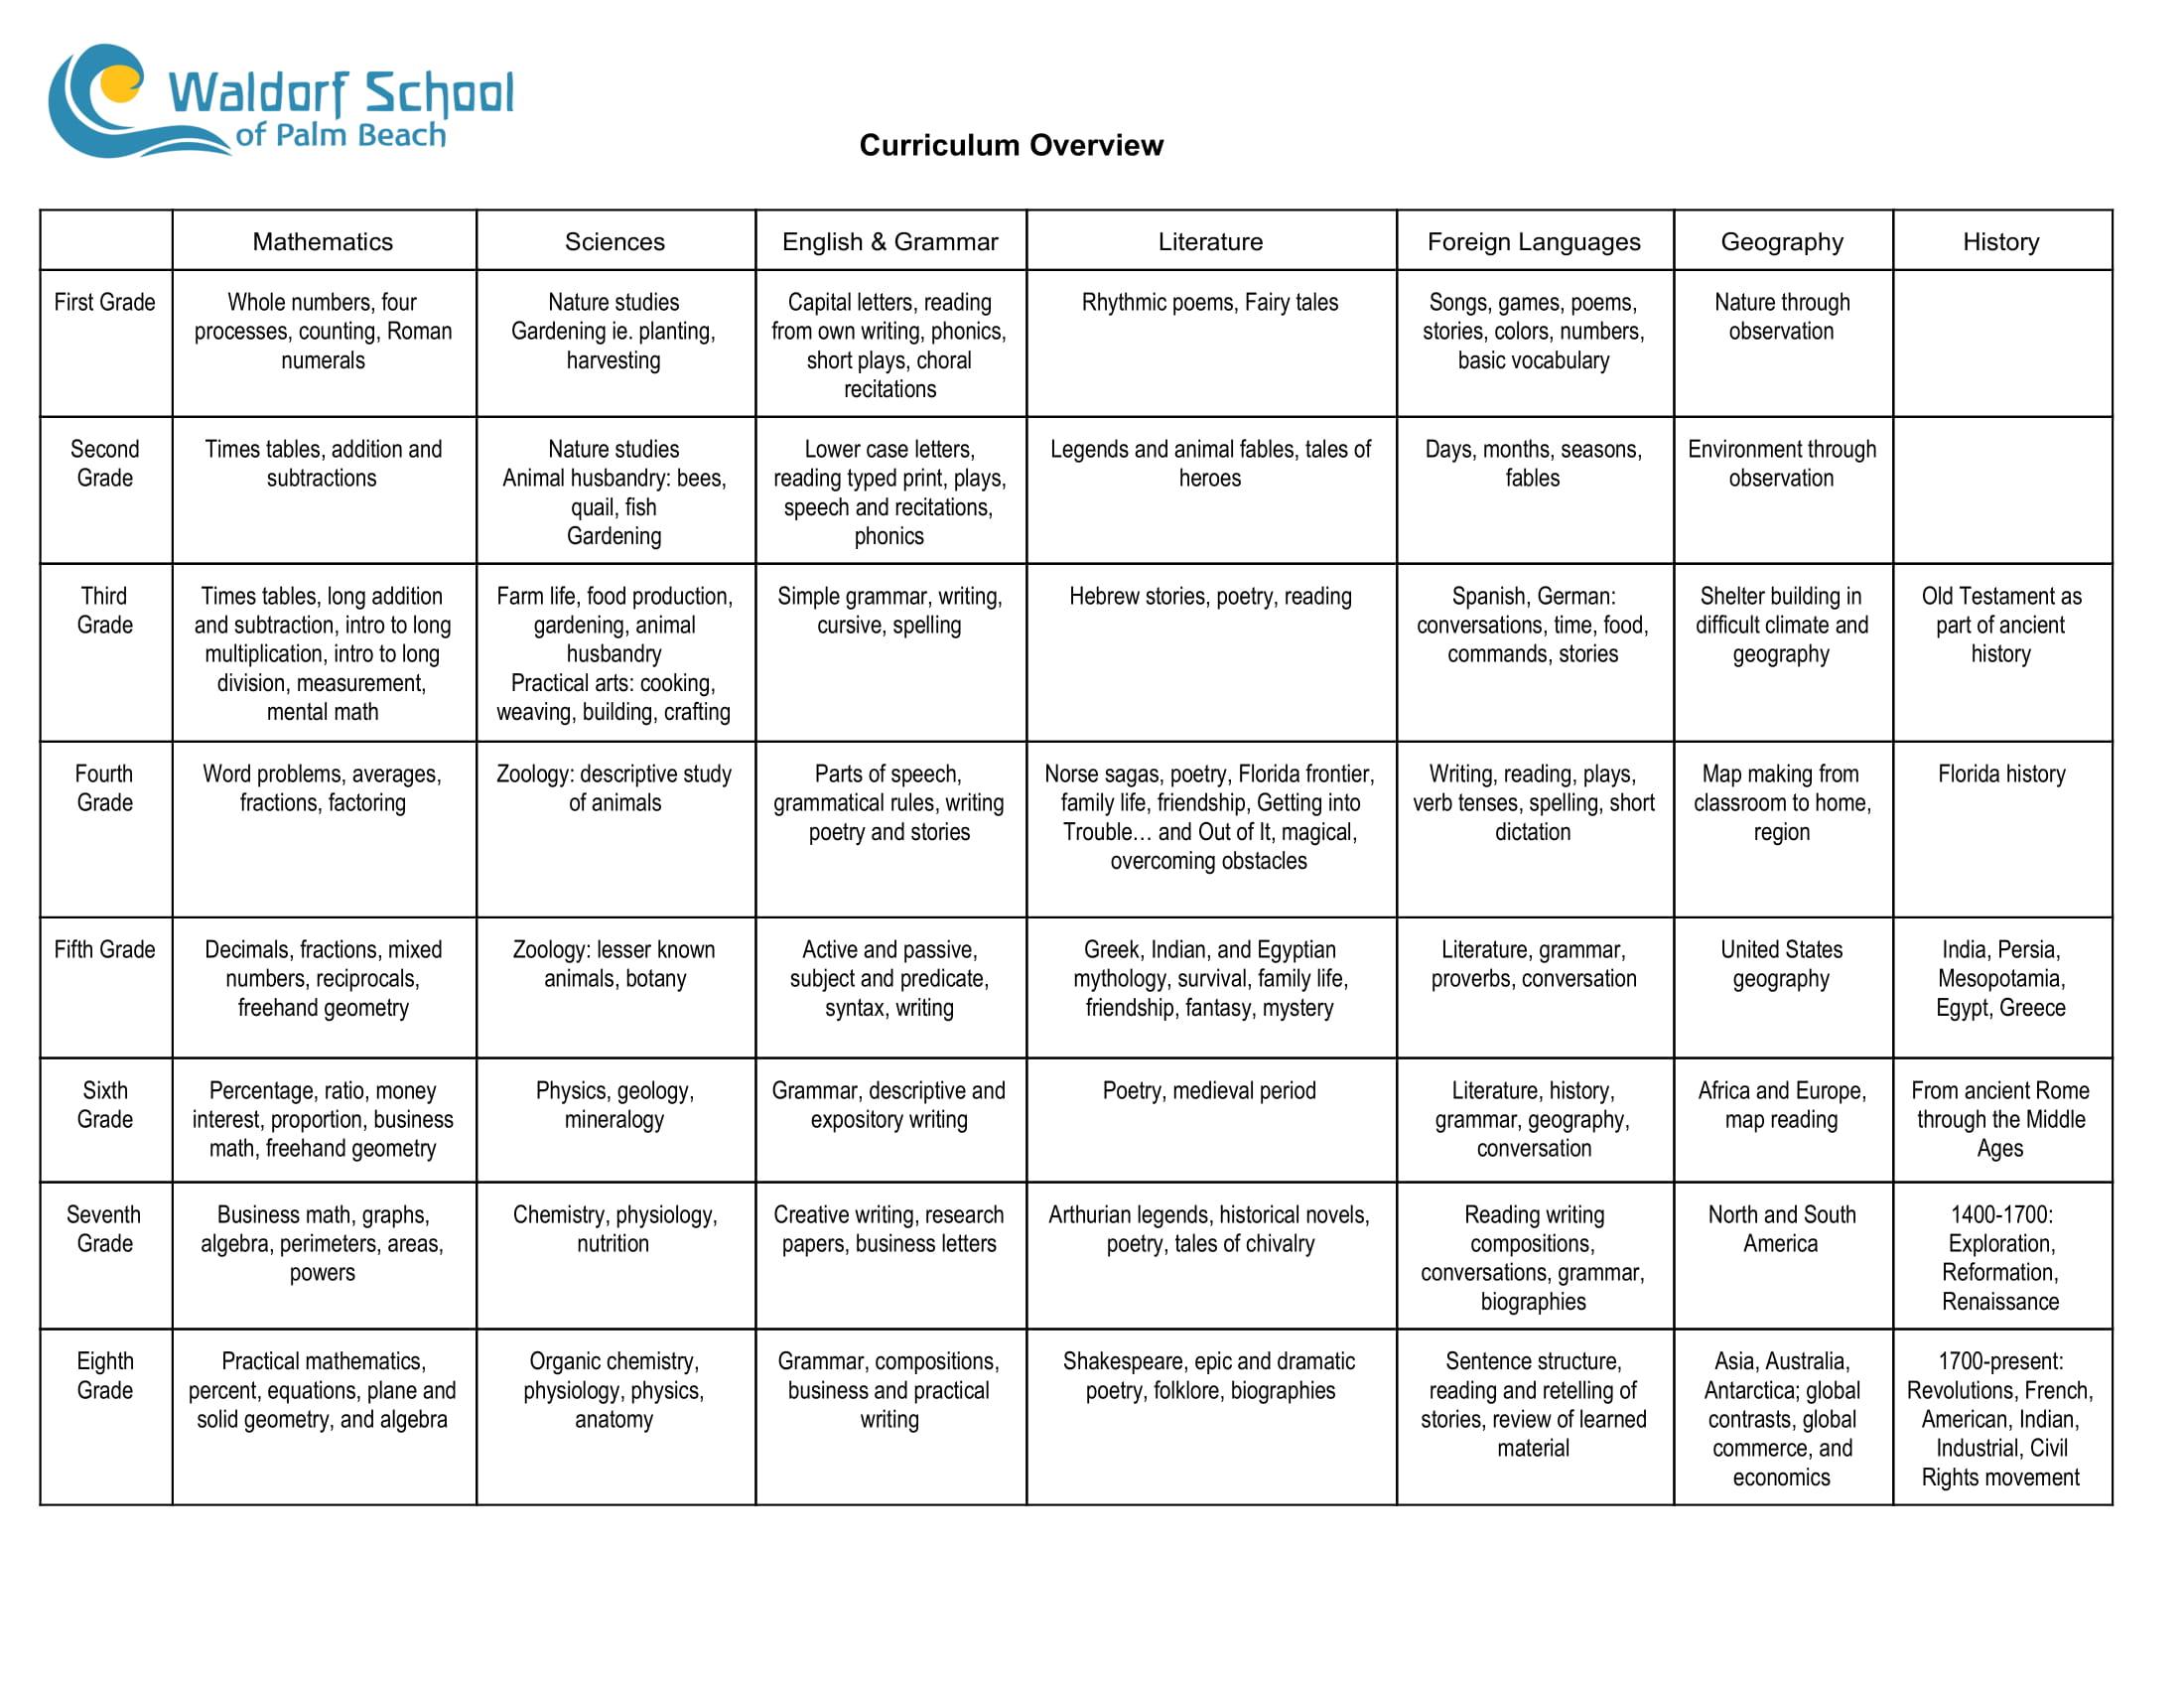 Waldorf School Curriculum Chart (1)-1.jpg